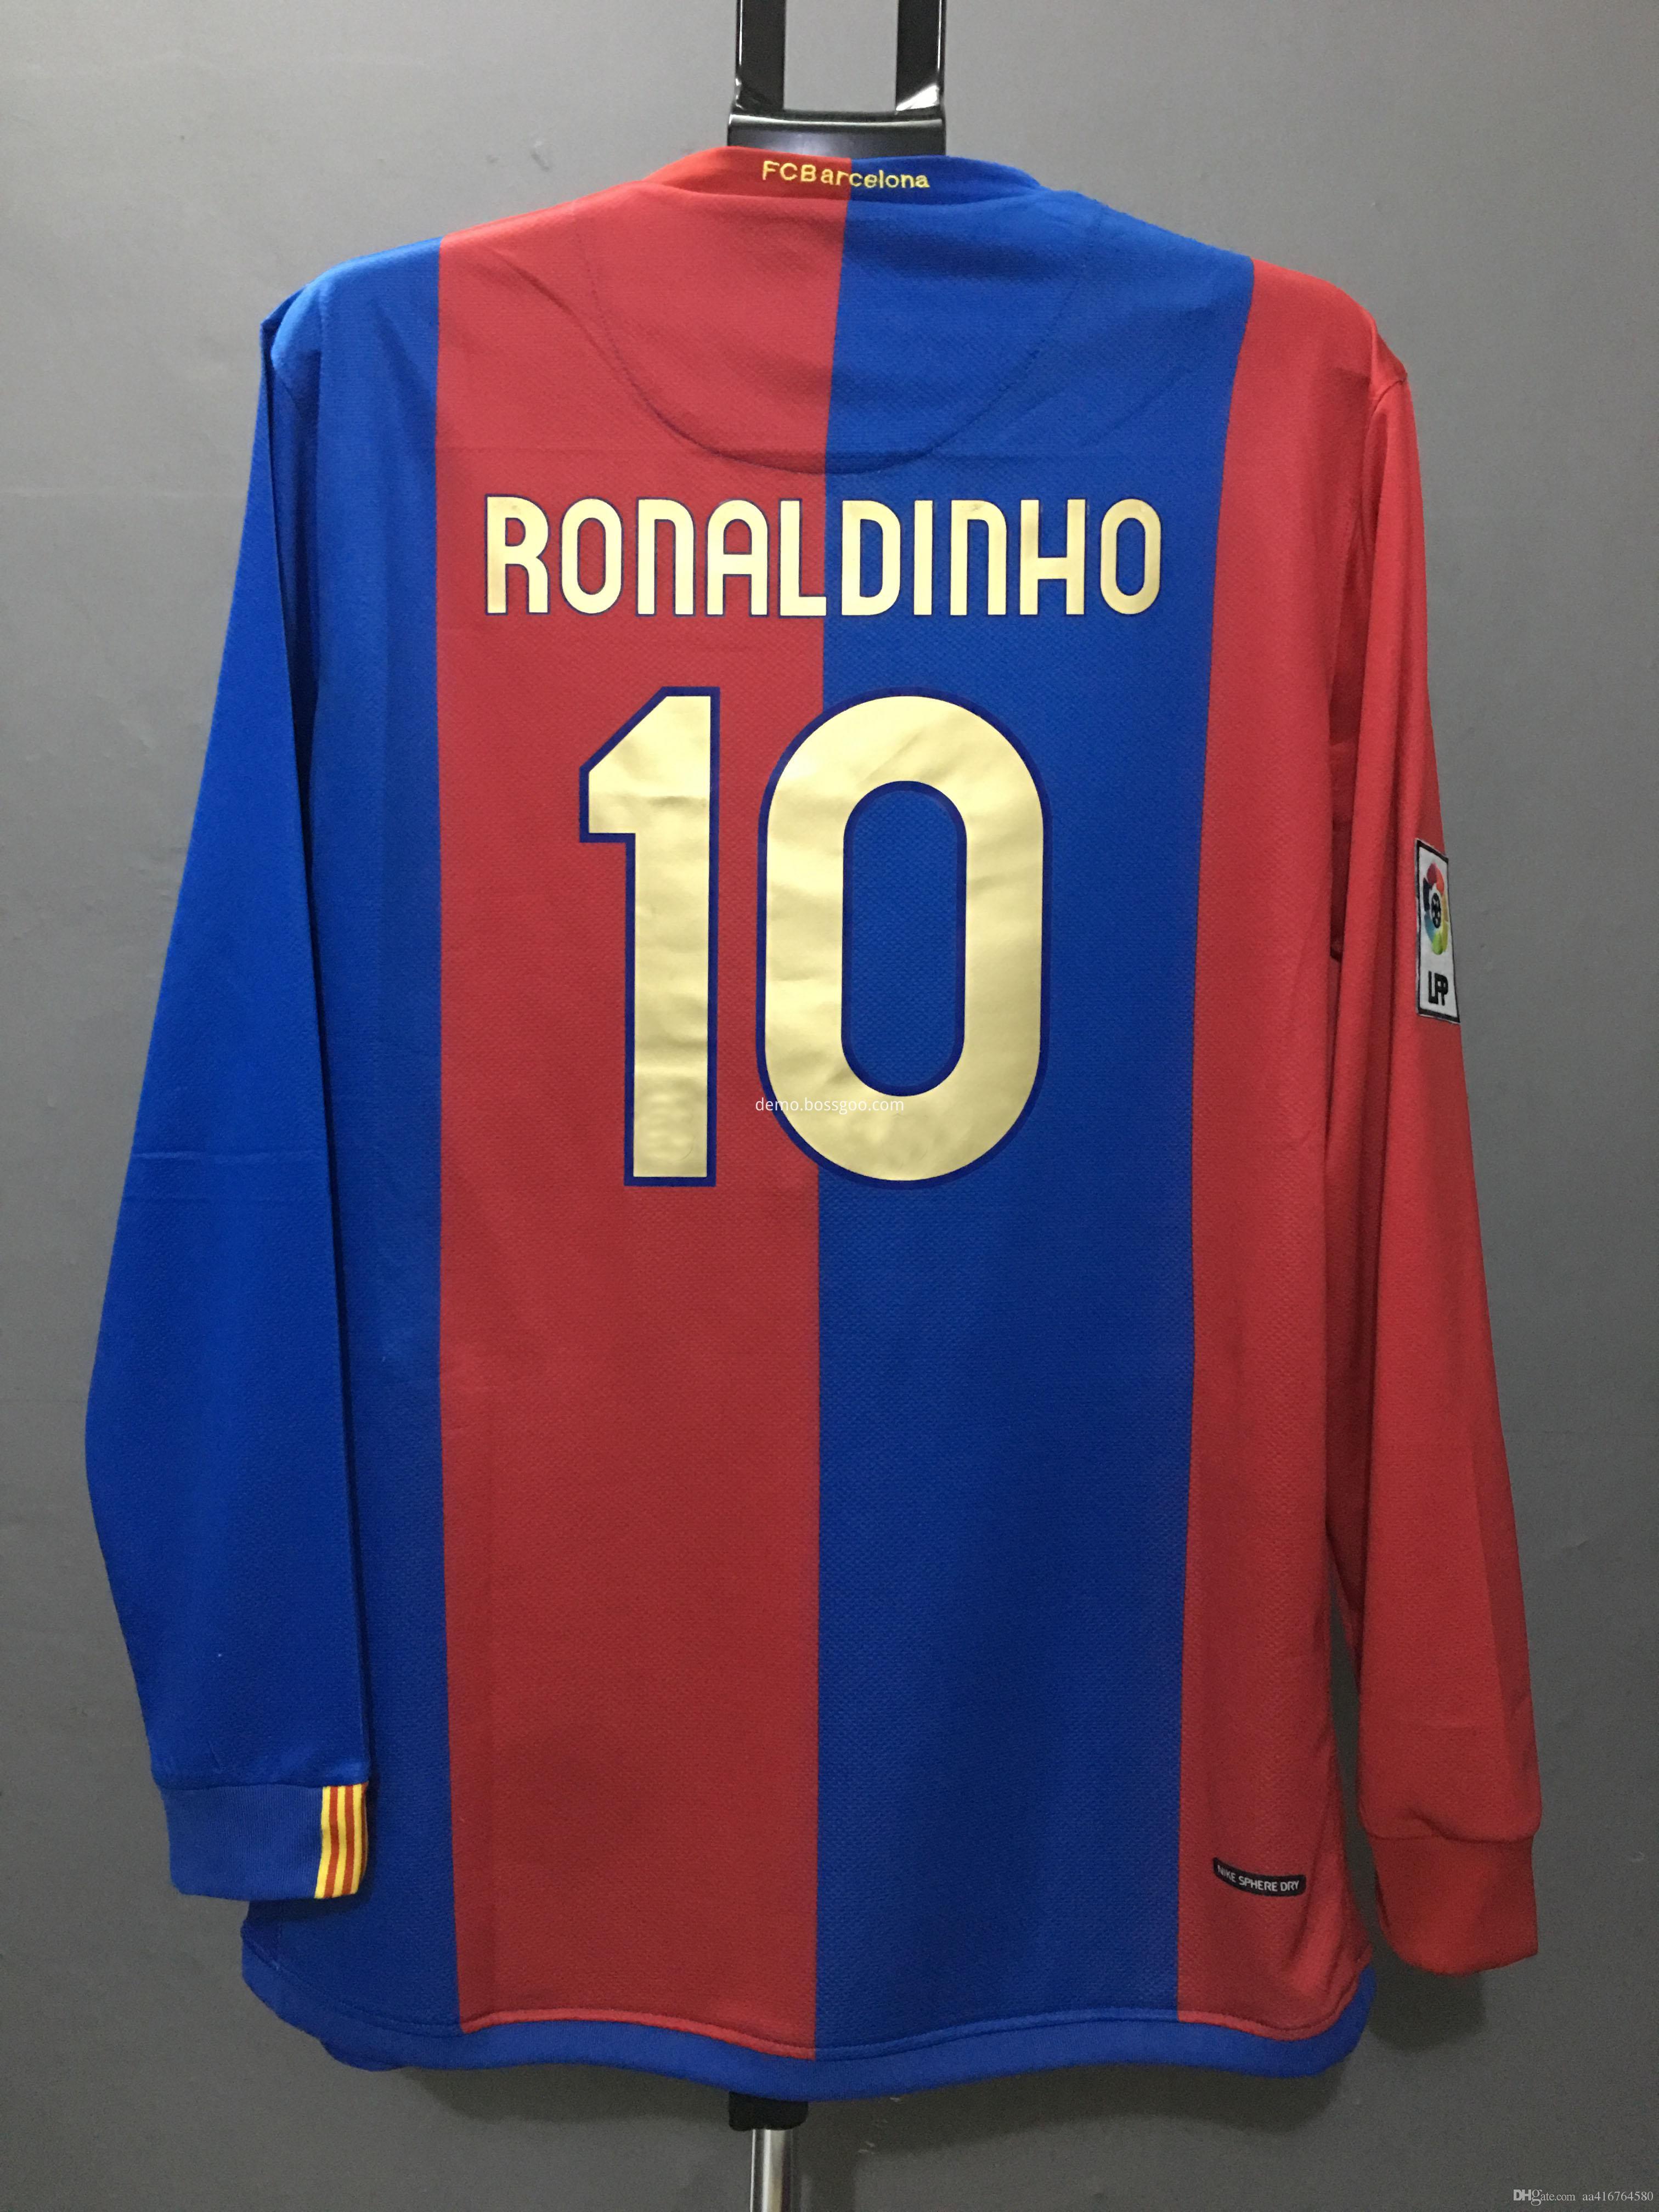 1899-1996-1997-2004-2005-2006-2007-2008-2009 (1)